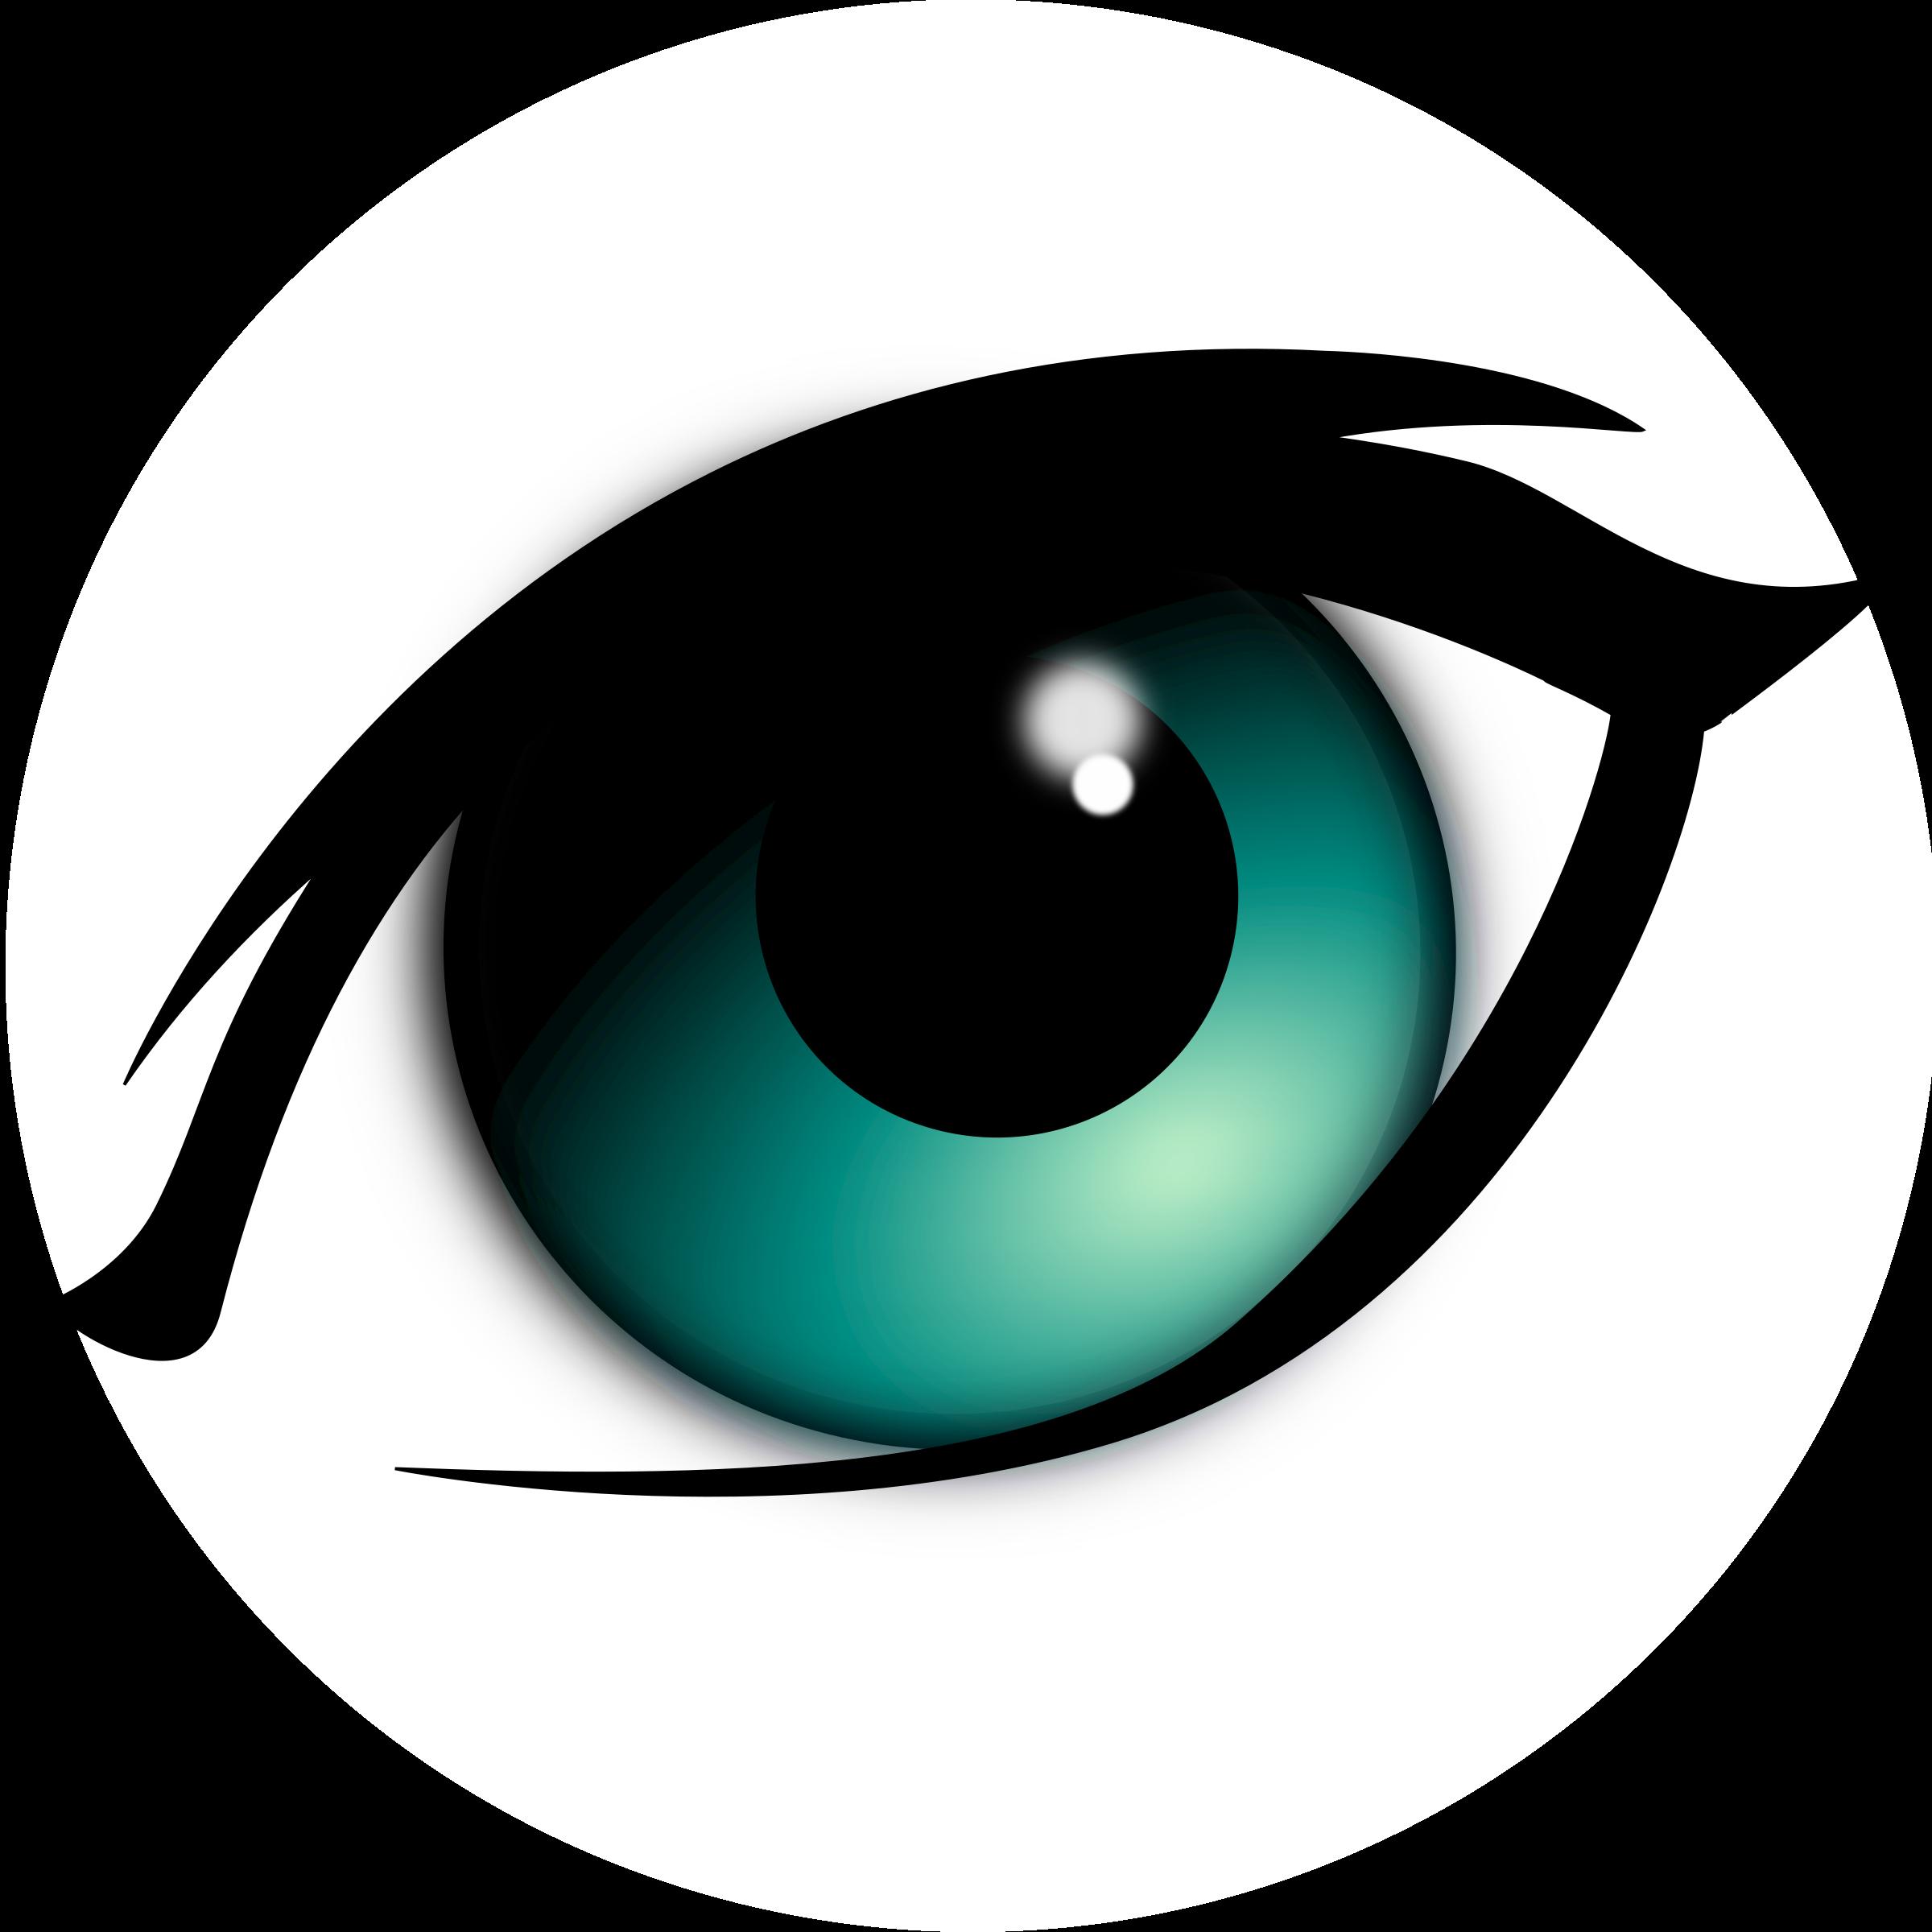 Narrowhouse cartoon eye remix. Eyes clipart outline